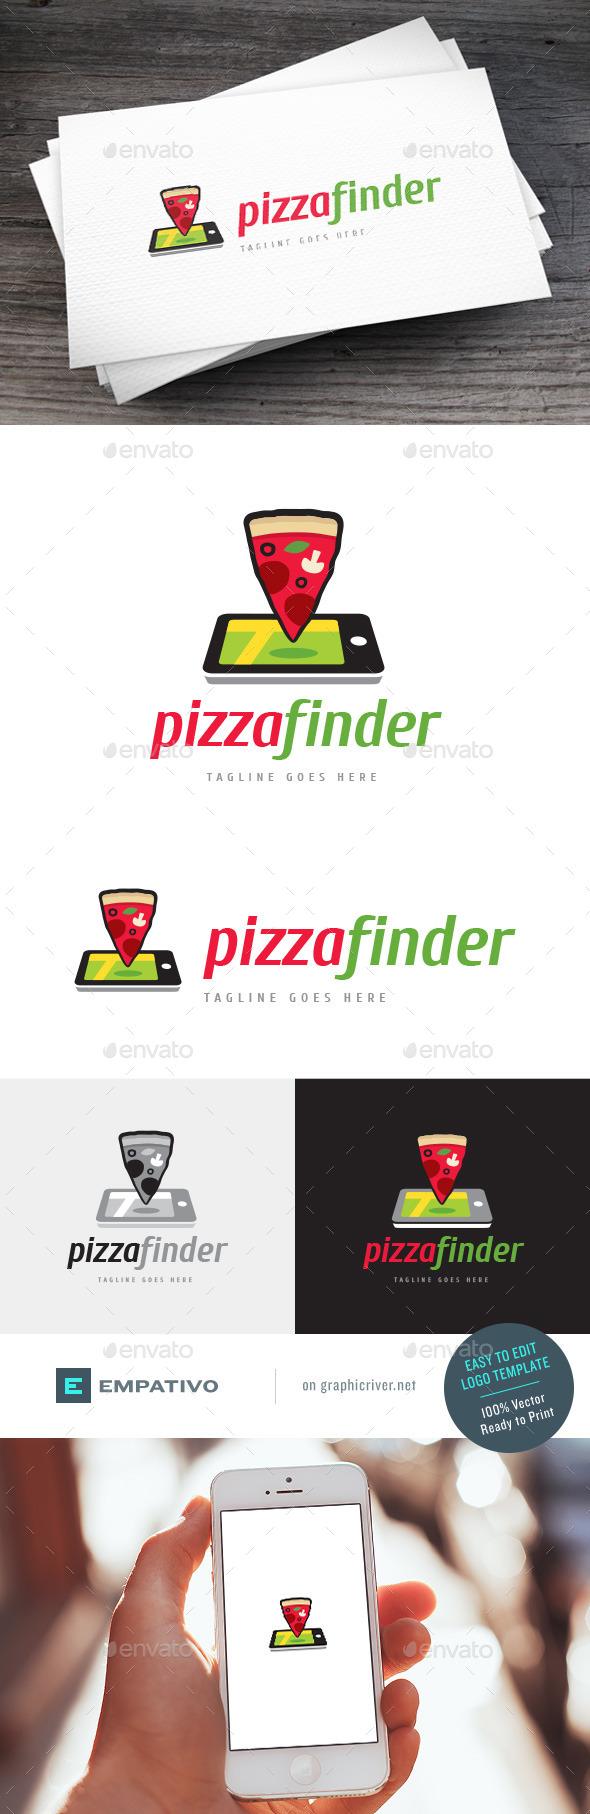 GraphicRiver Pizza Finder Logo Template 11590573